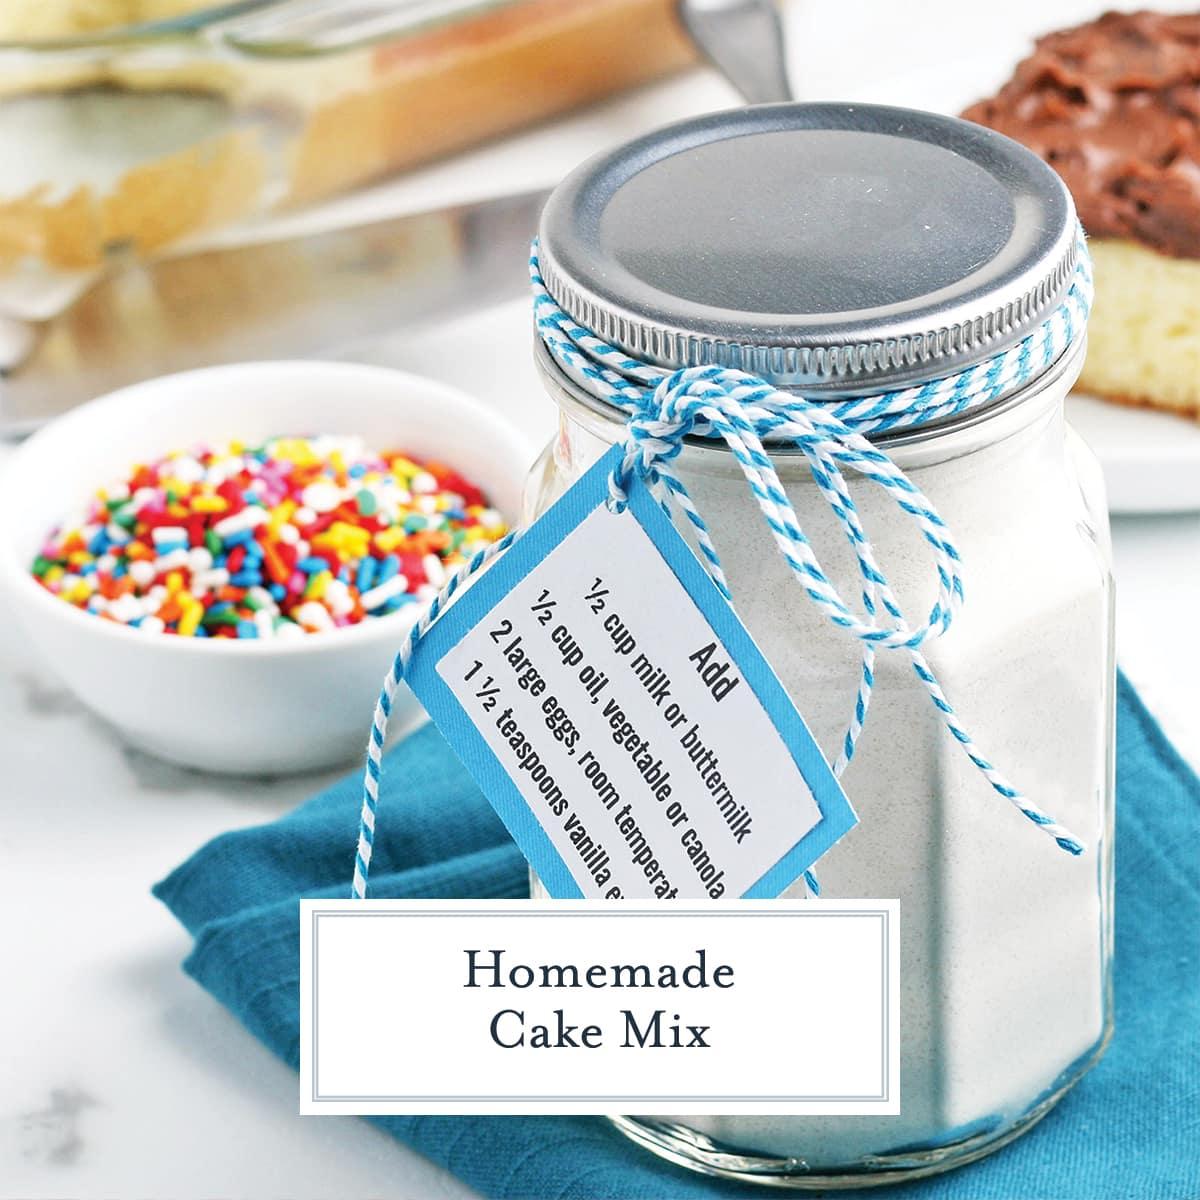 mason jar of cake mix with a label